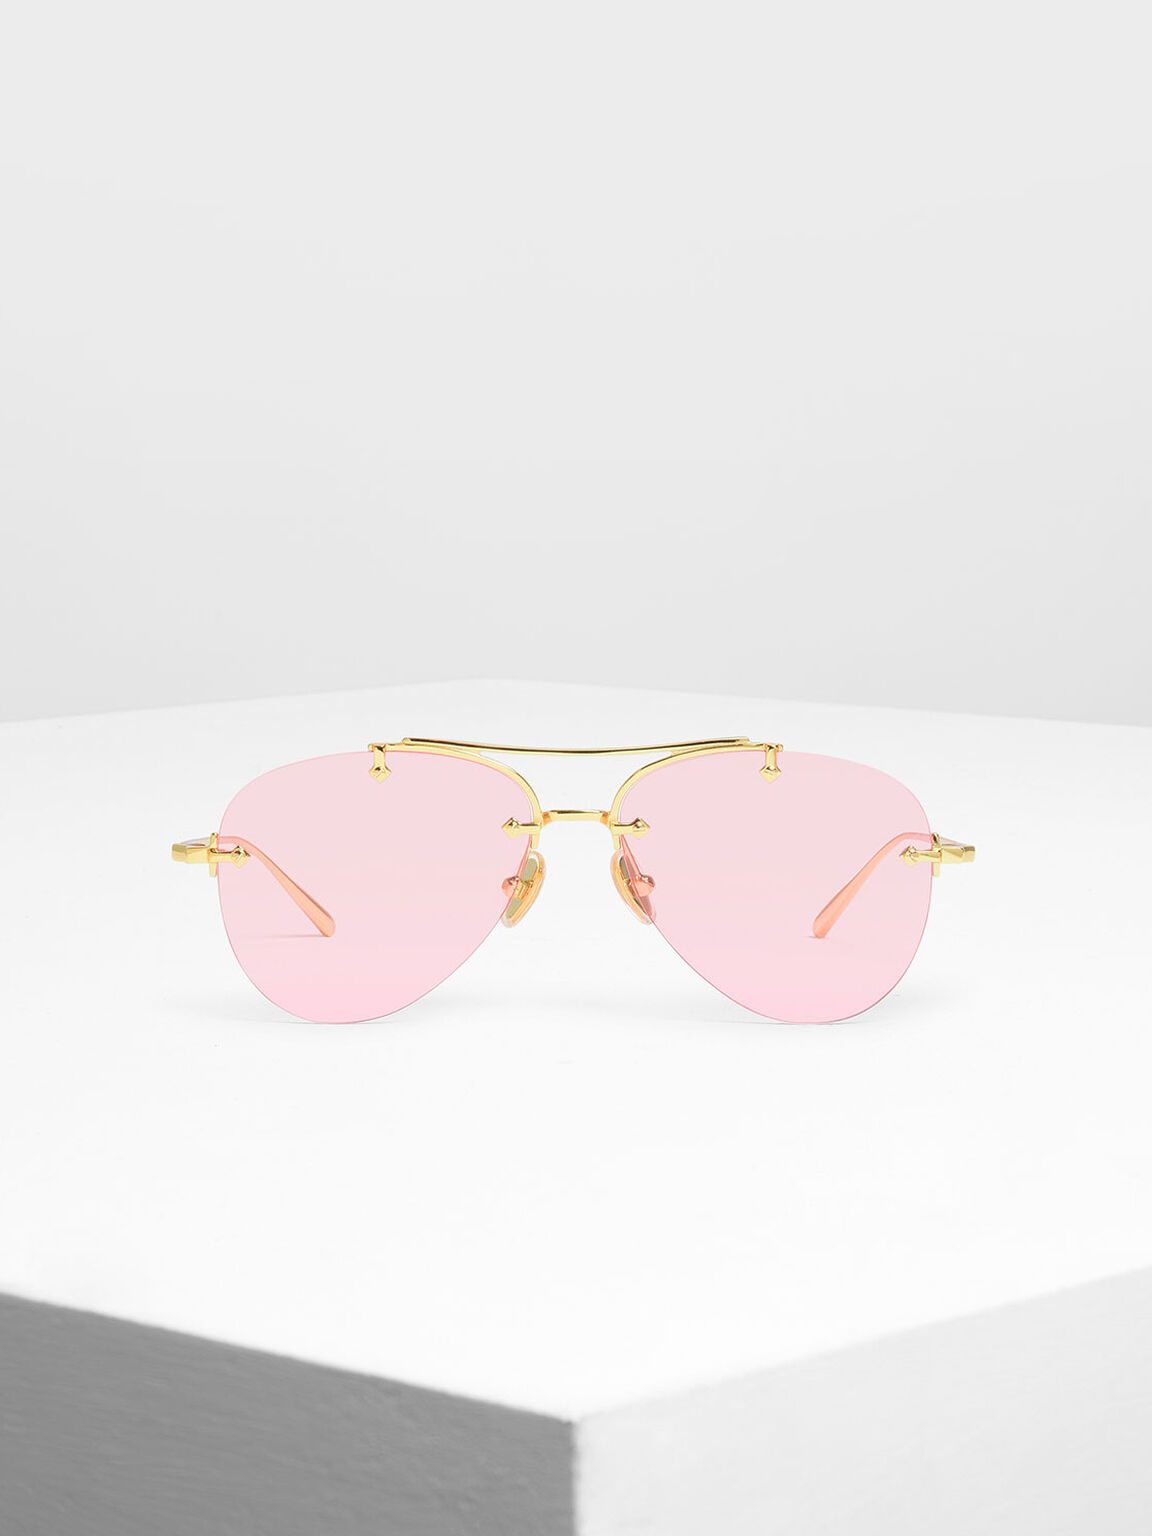 Frameless Aviator Sunglasses, Pink, hi-res